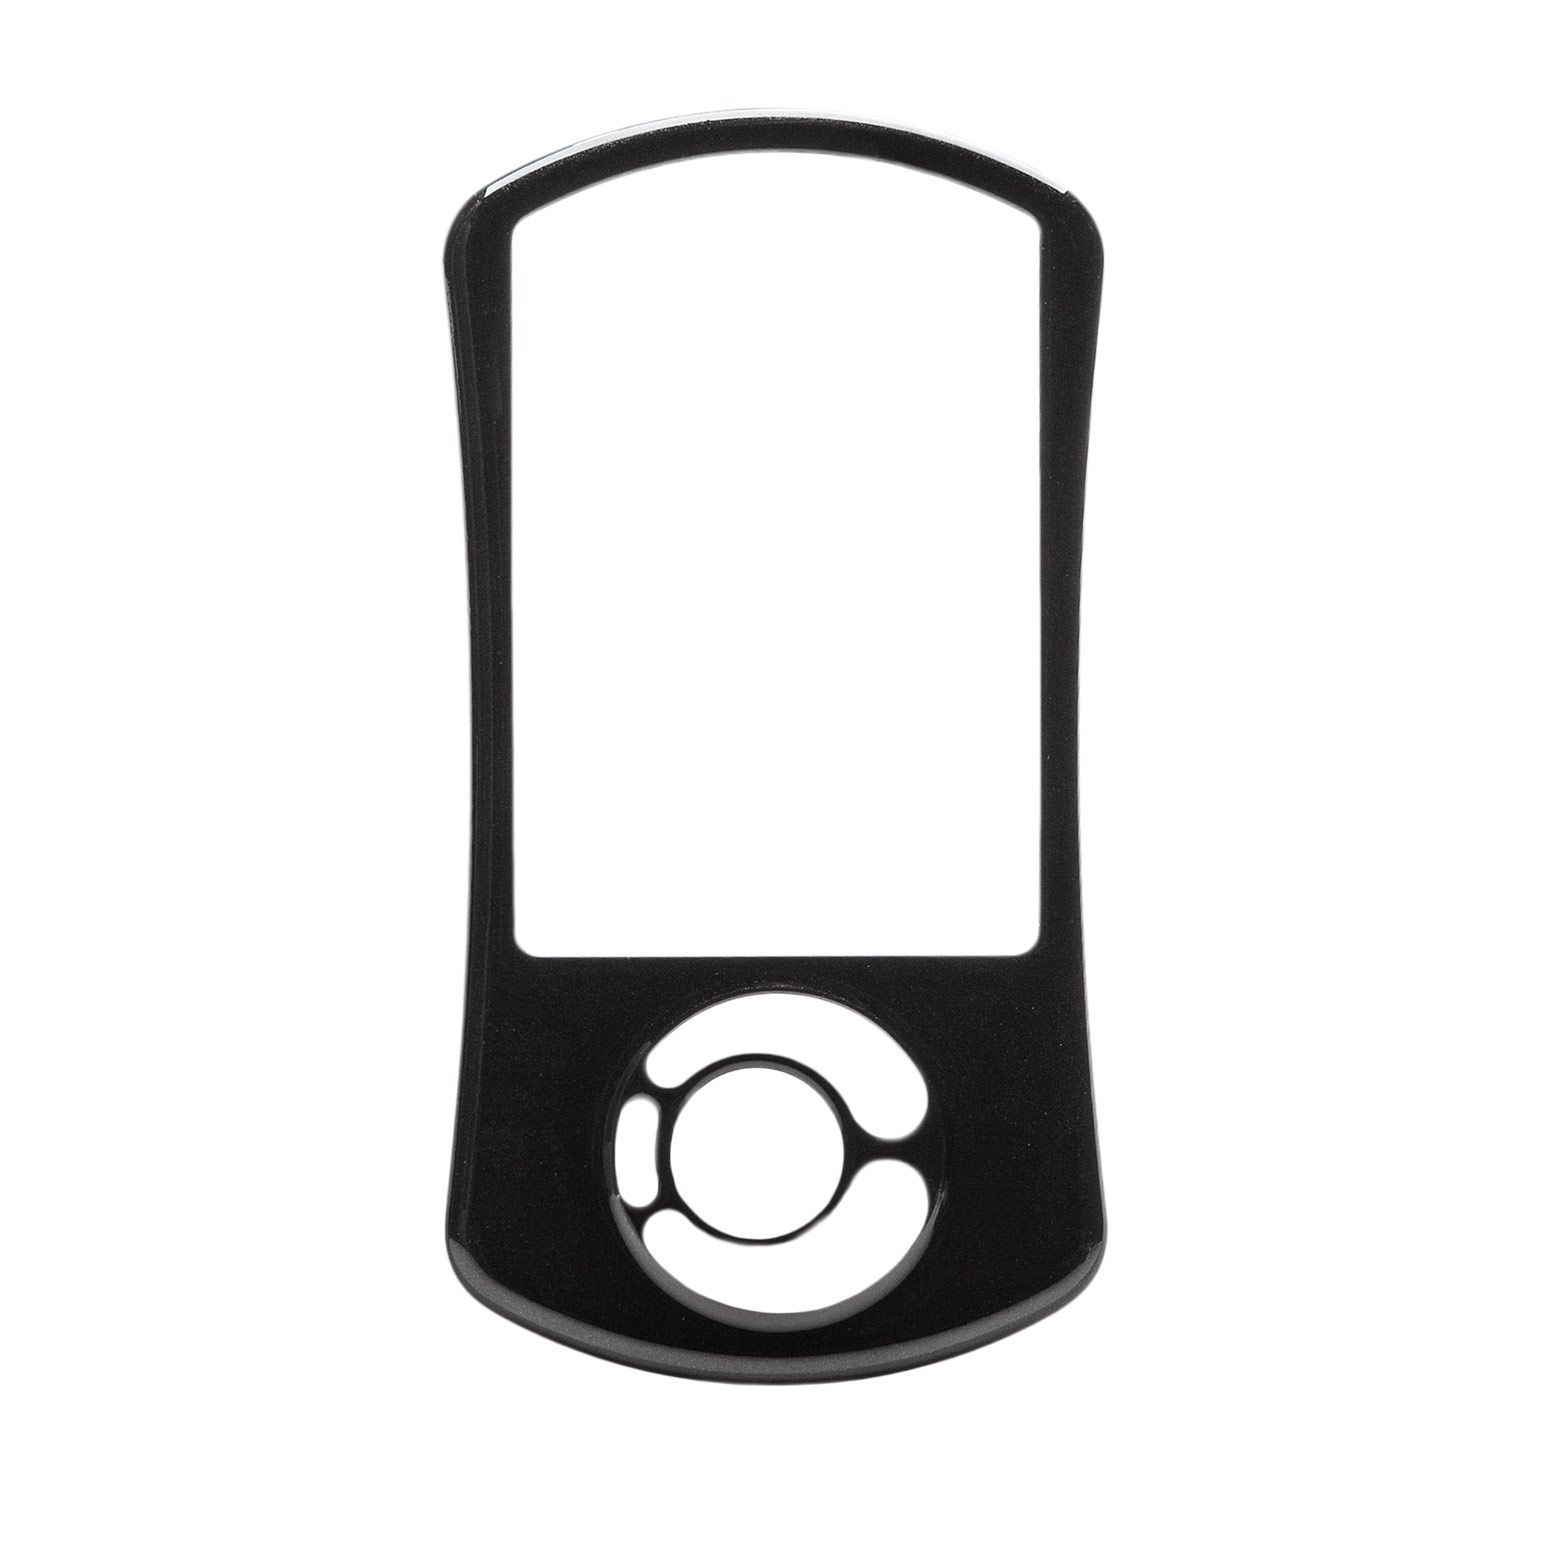 Tuxedo Black Accessport V3 Faceplate